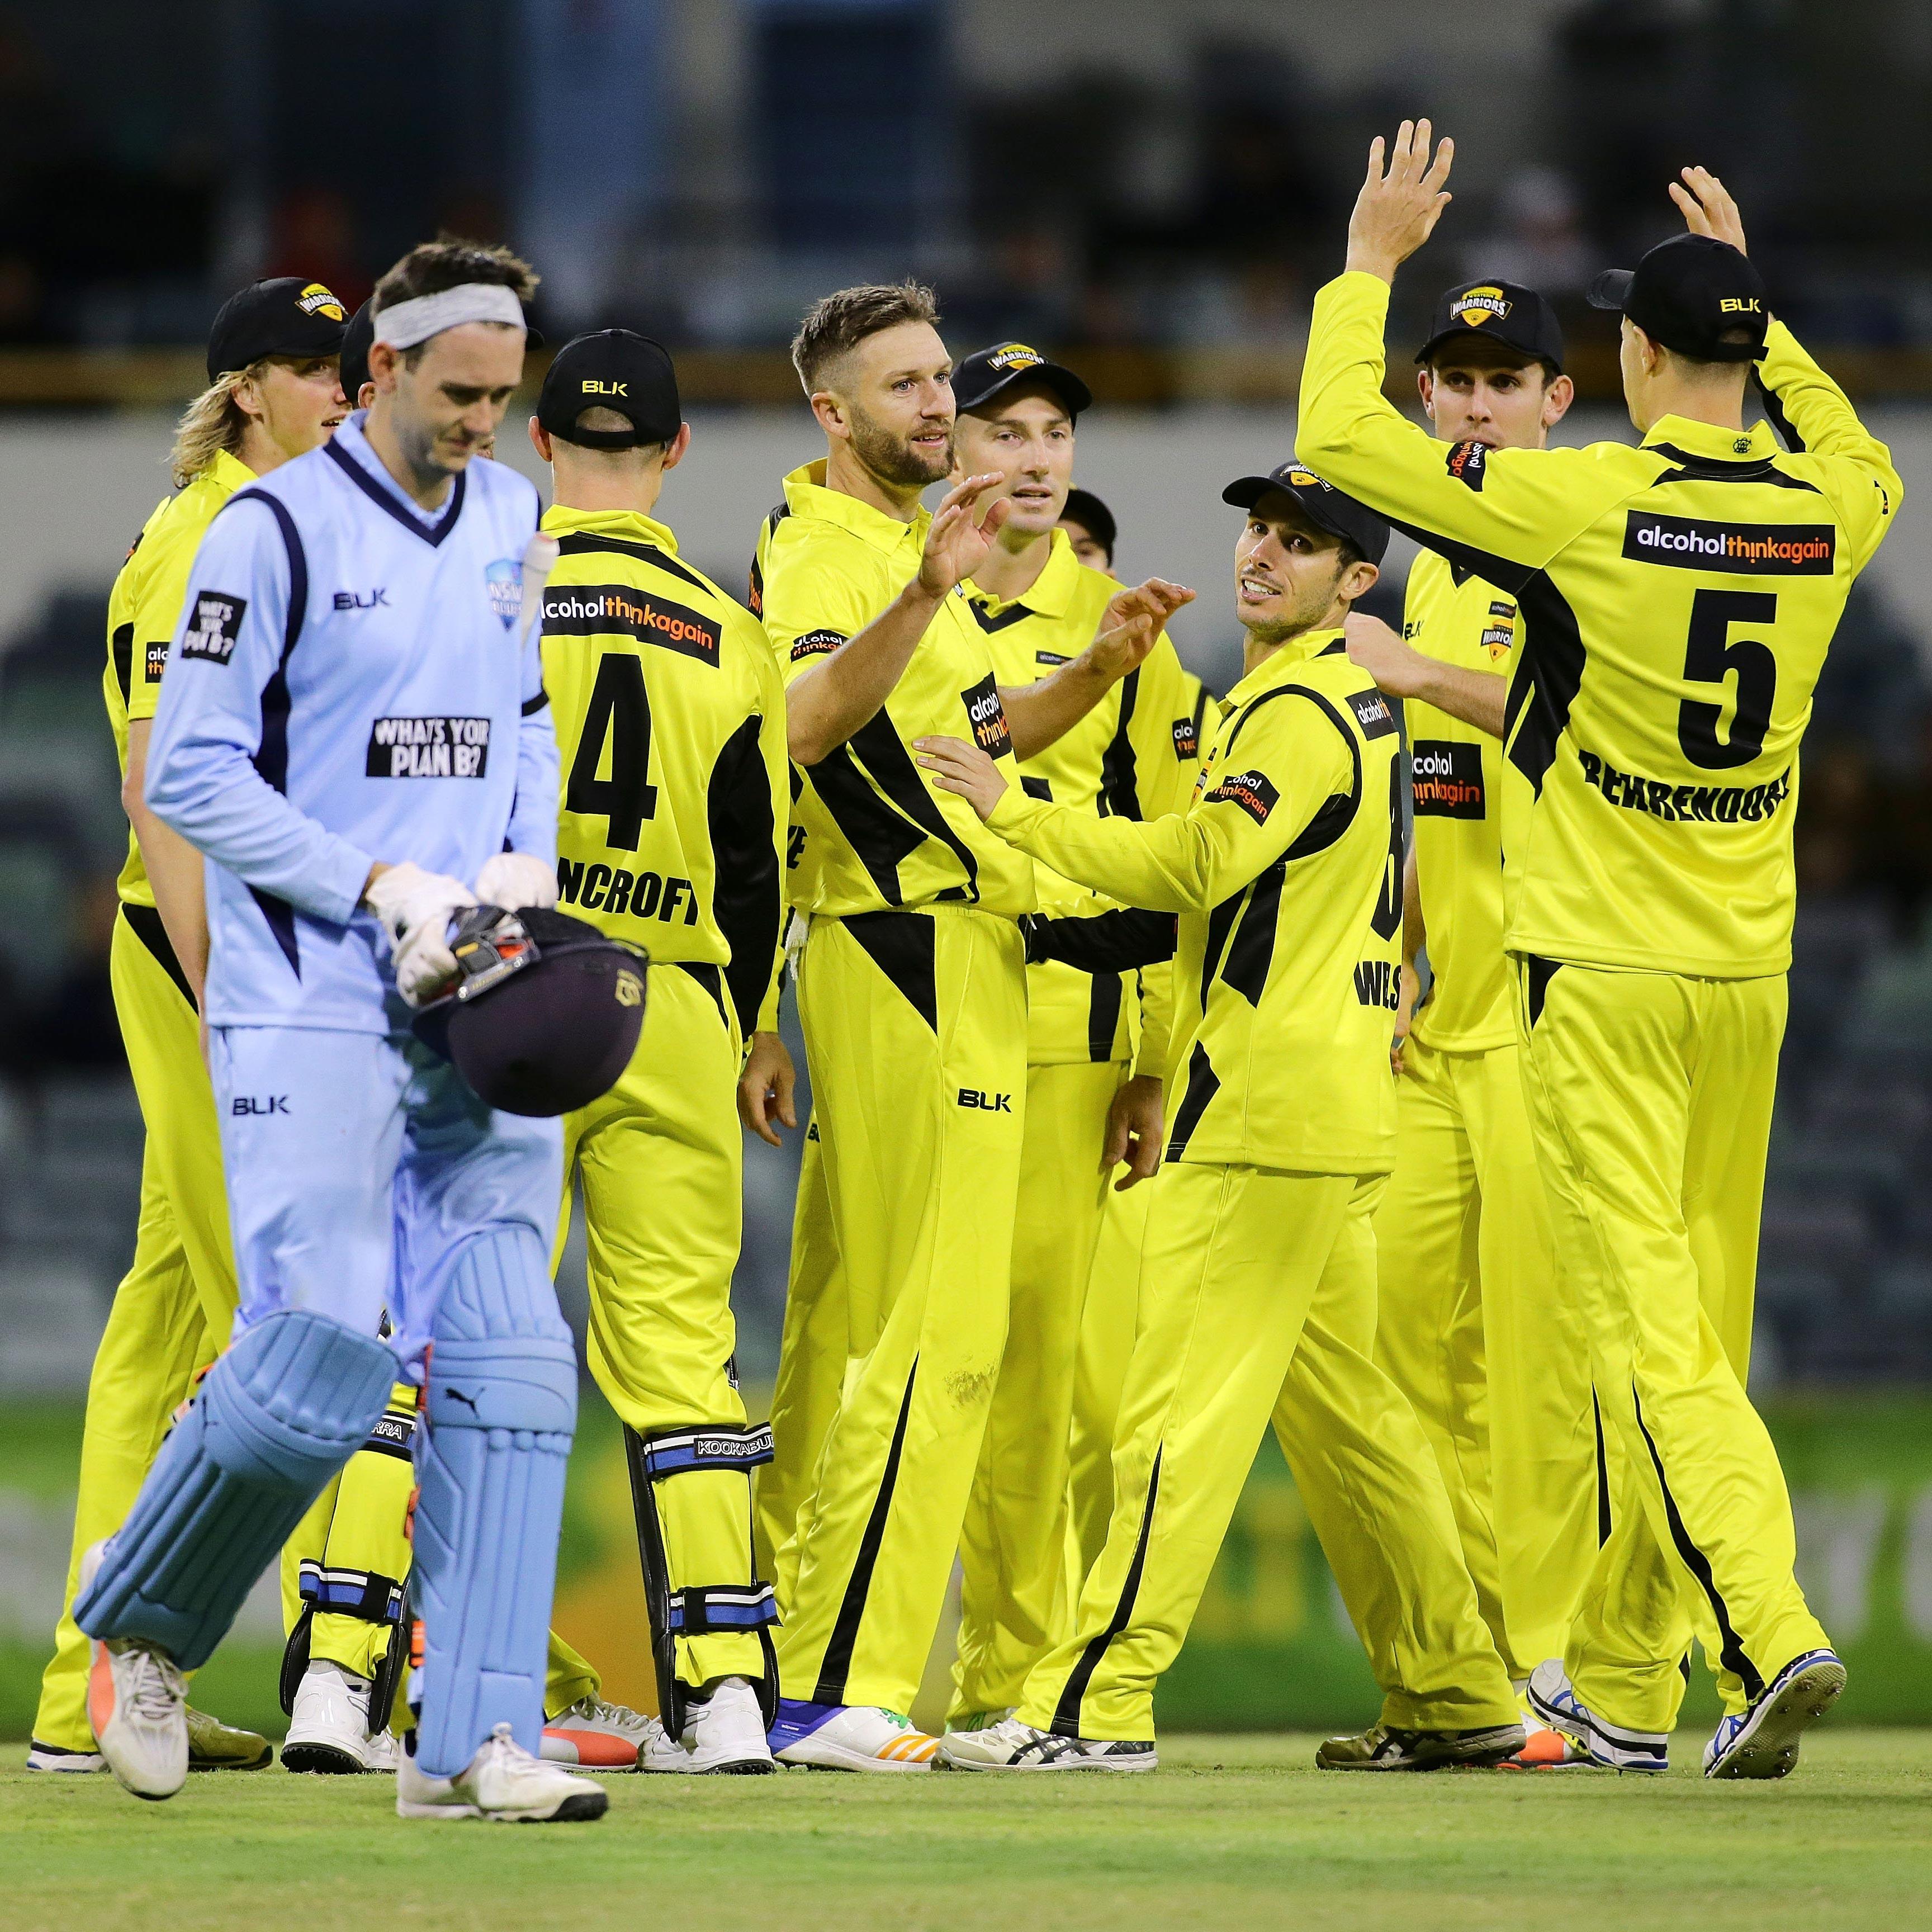 WA celebrate the wicket of NSW's Kurtis Patterson // Getty